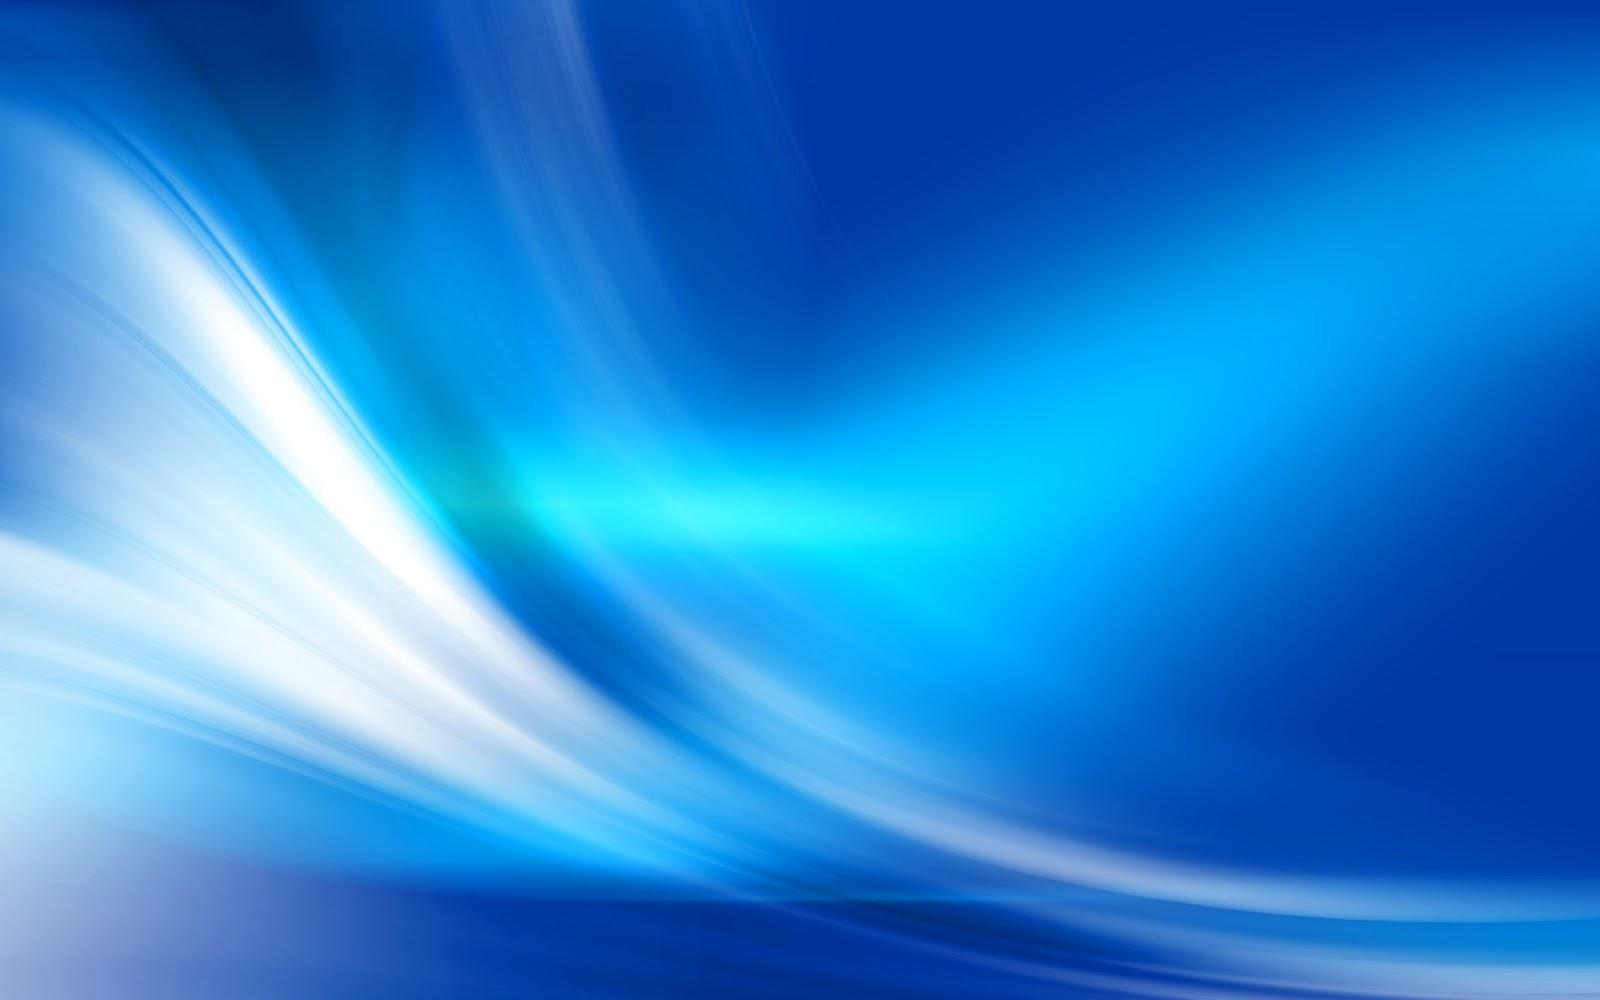 Hd Wallpapers Beautiful Blue Abstract Wallpaper Hd Photos